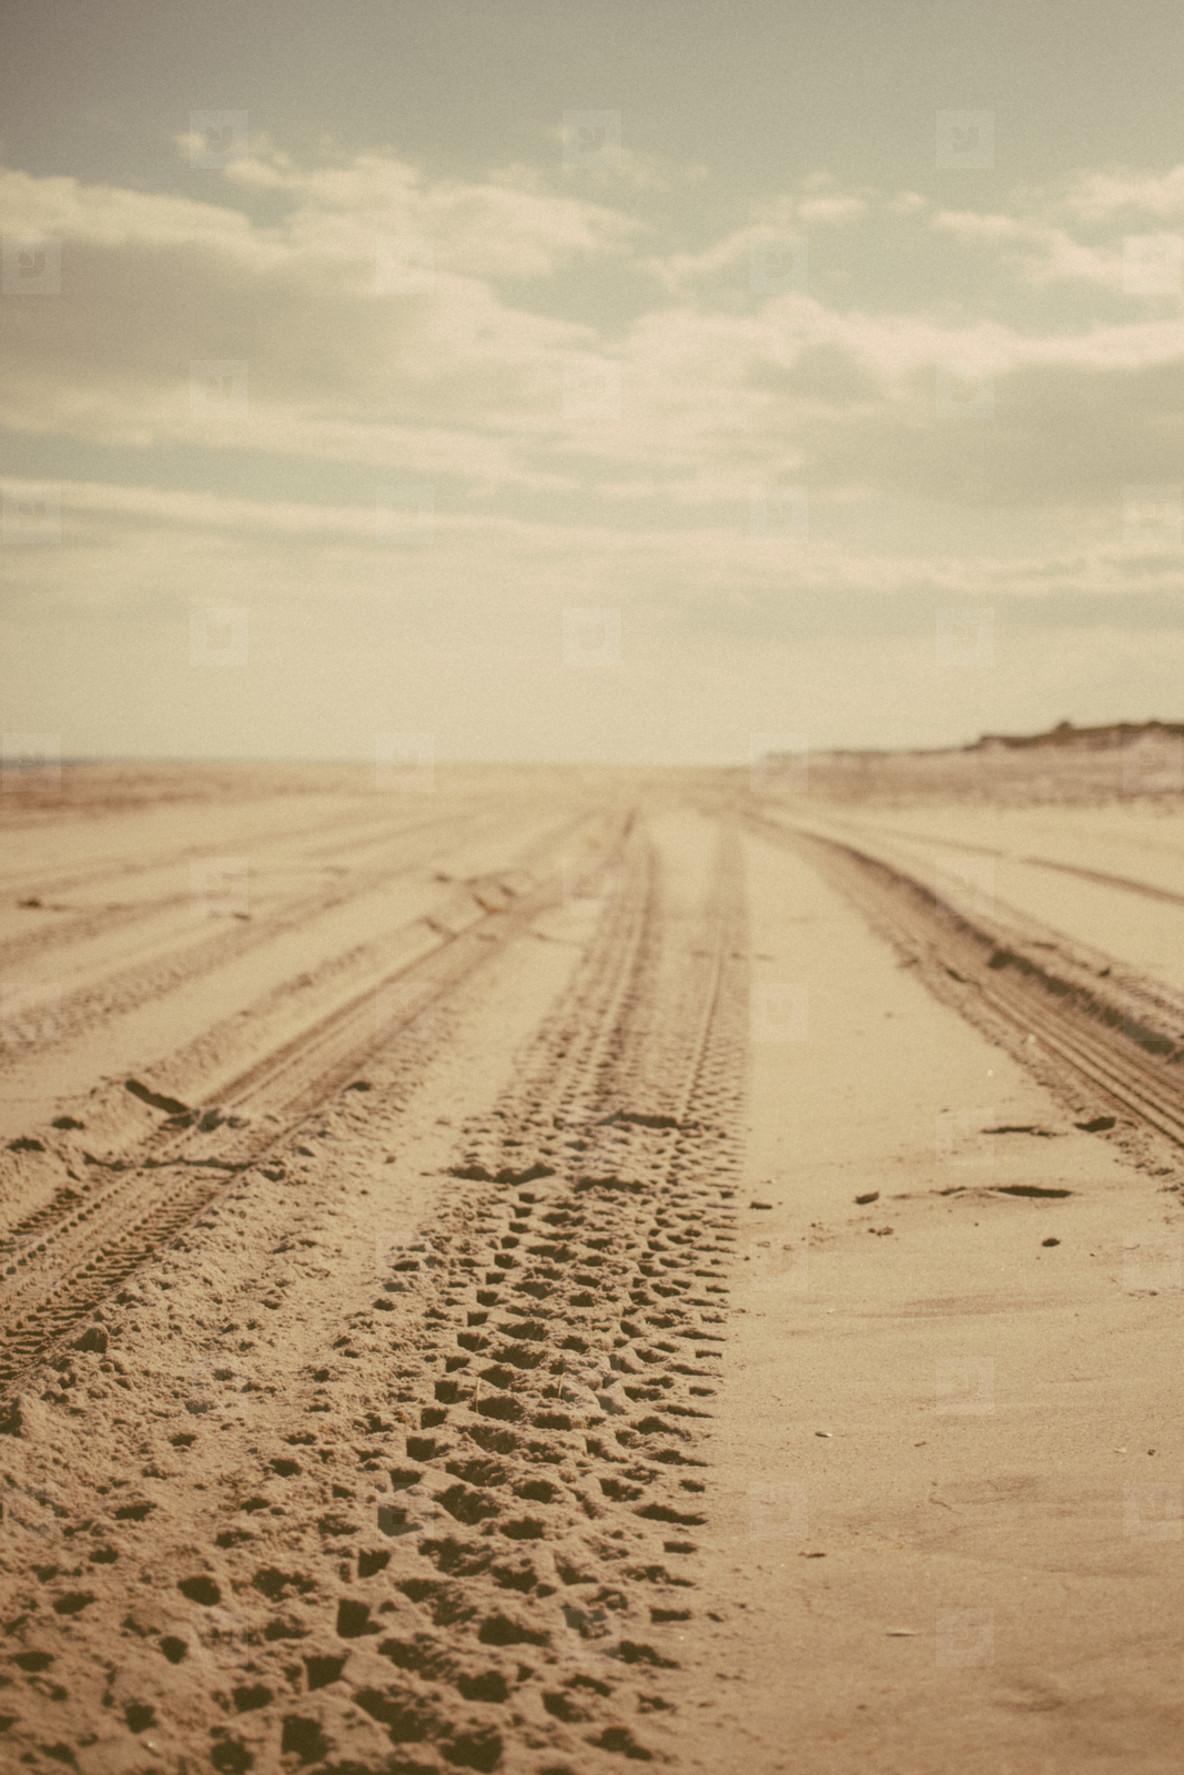 Tracks on beach